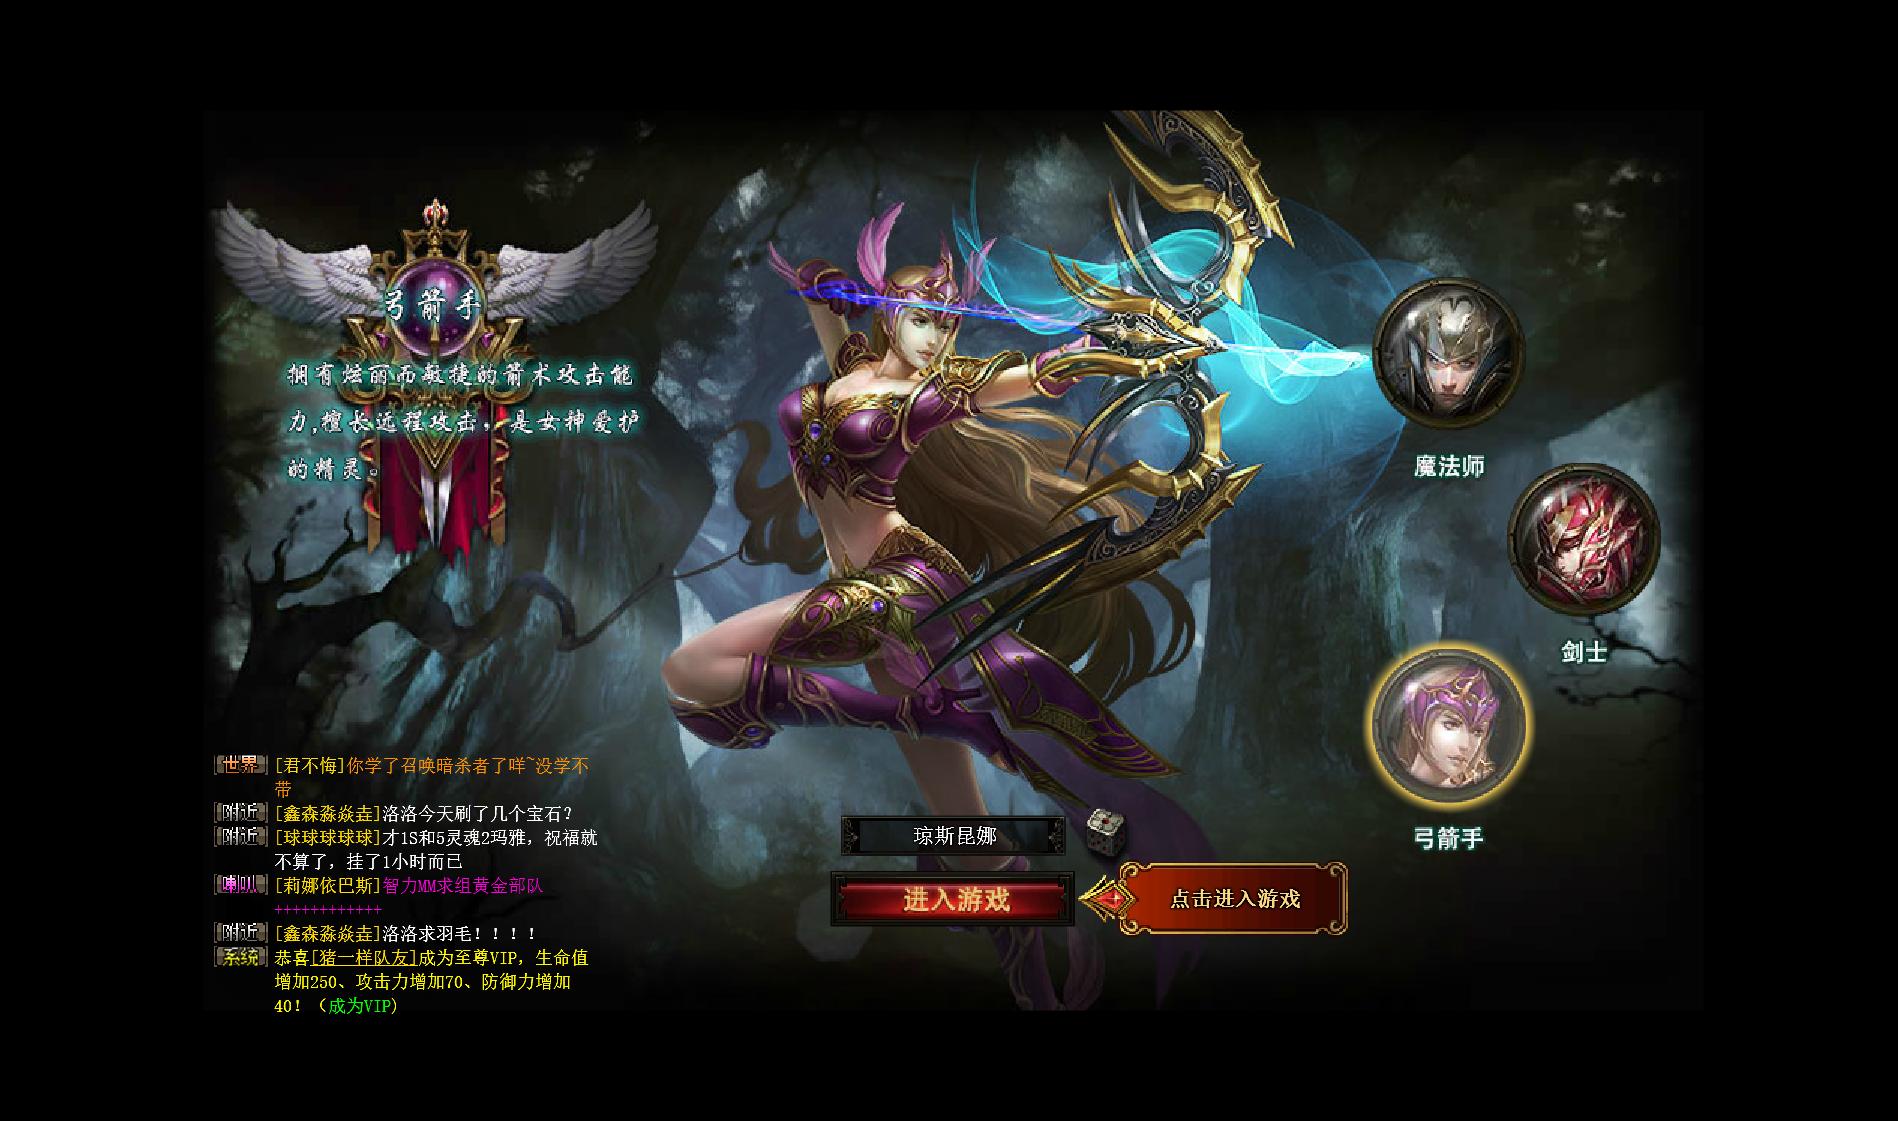 3dm 大天使之剑 详细评测 可以放弃 暗黑3 了